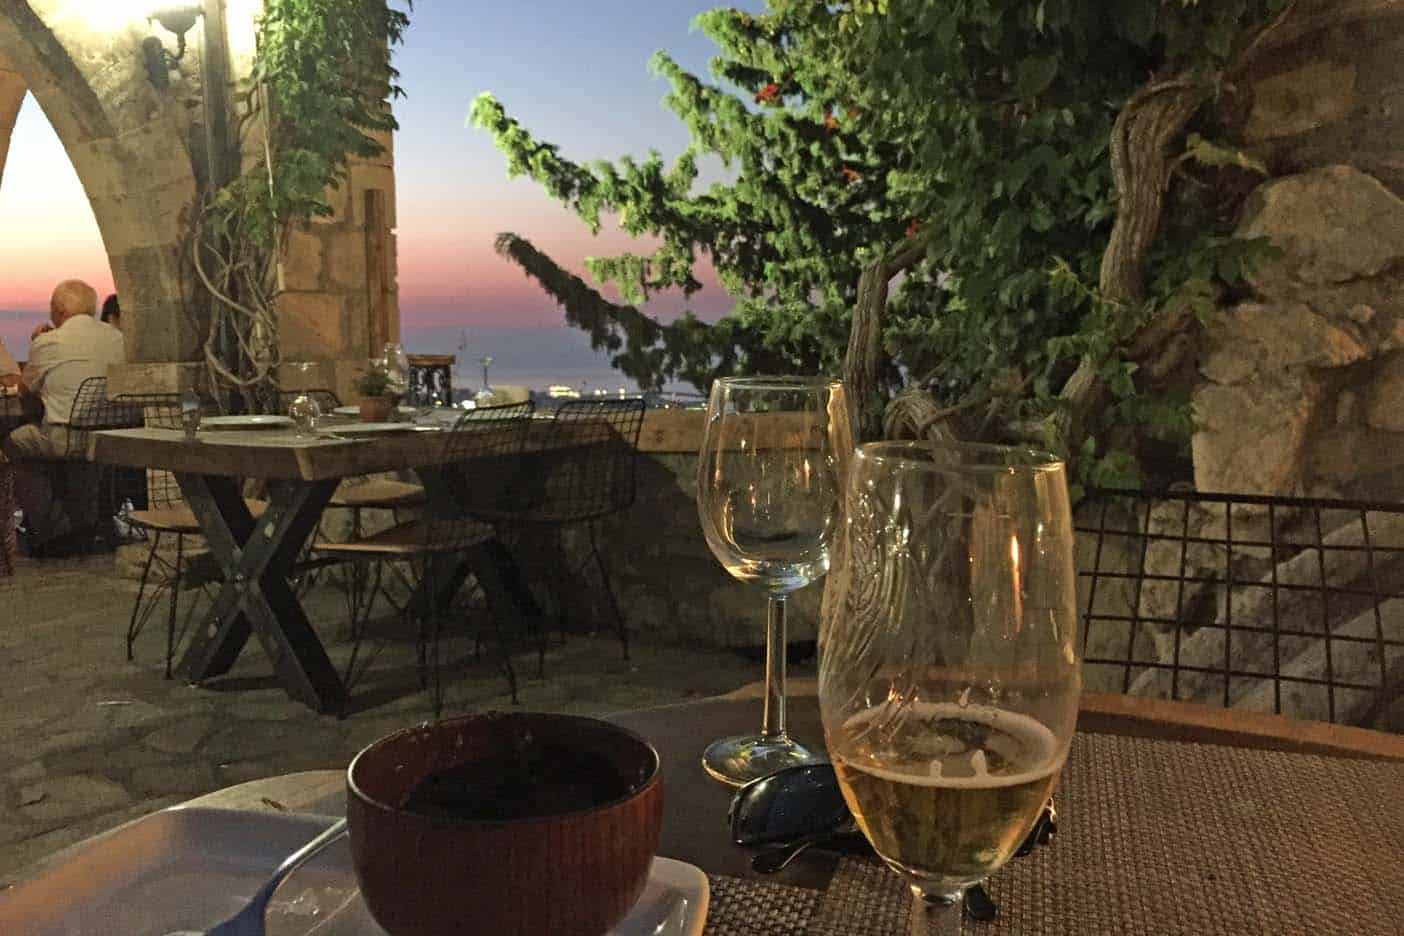 Cyprus klooster restaurant